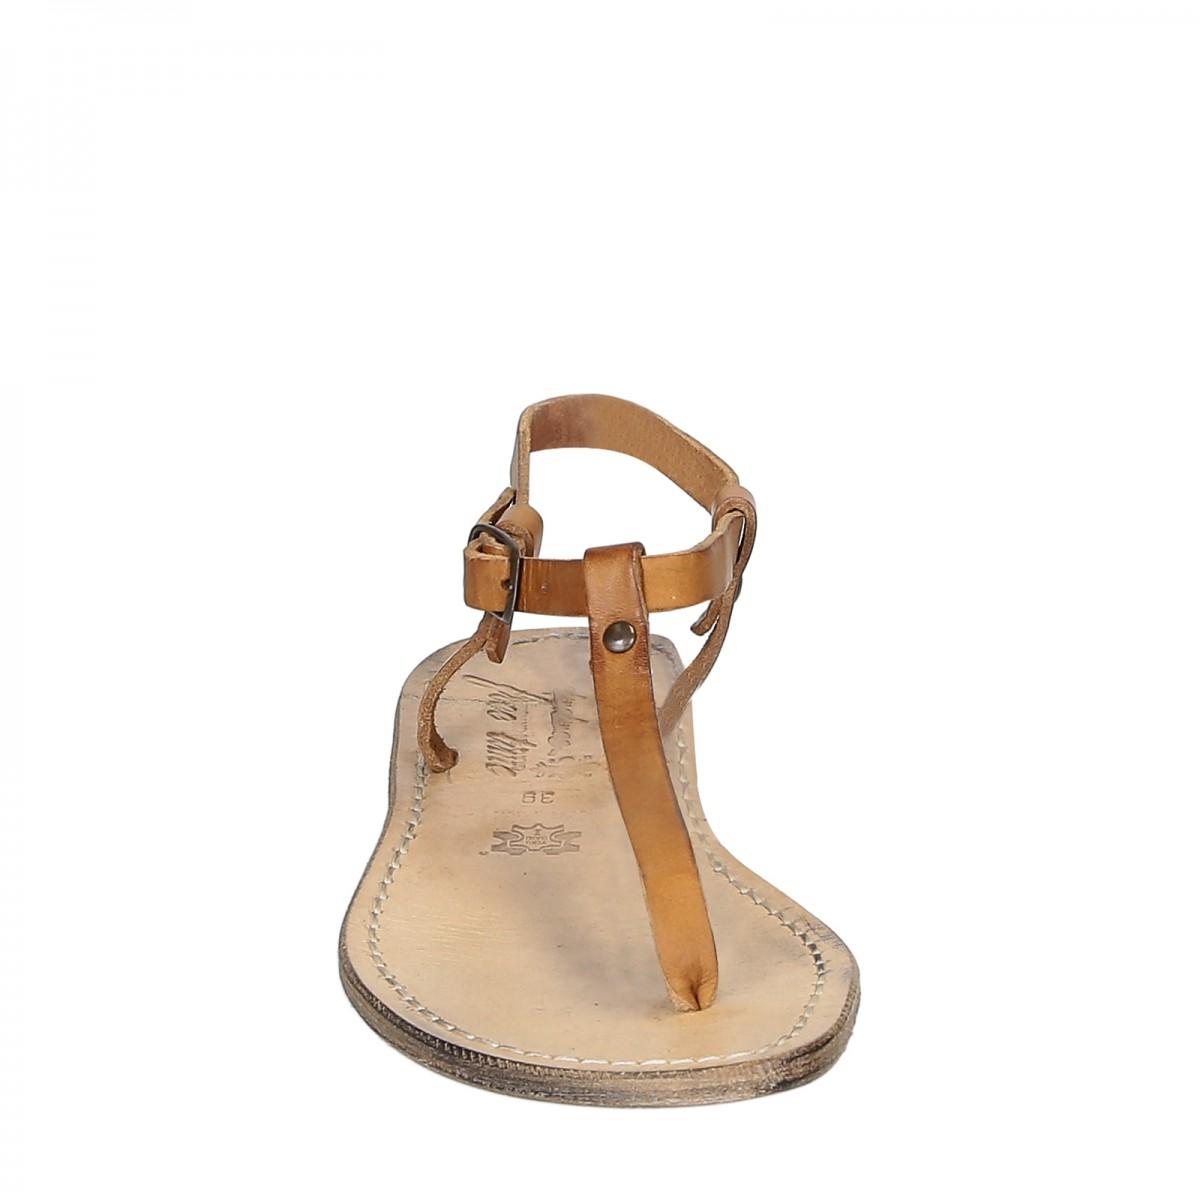 handgefertigte italienische sandalen aus hellbraunem vintage effekt leder gianluca das leder. Black Bedroom Furniture Sets. Home Design Ideas